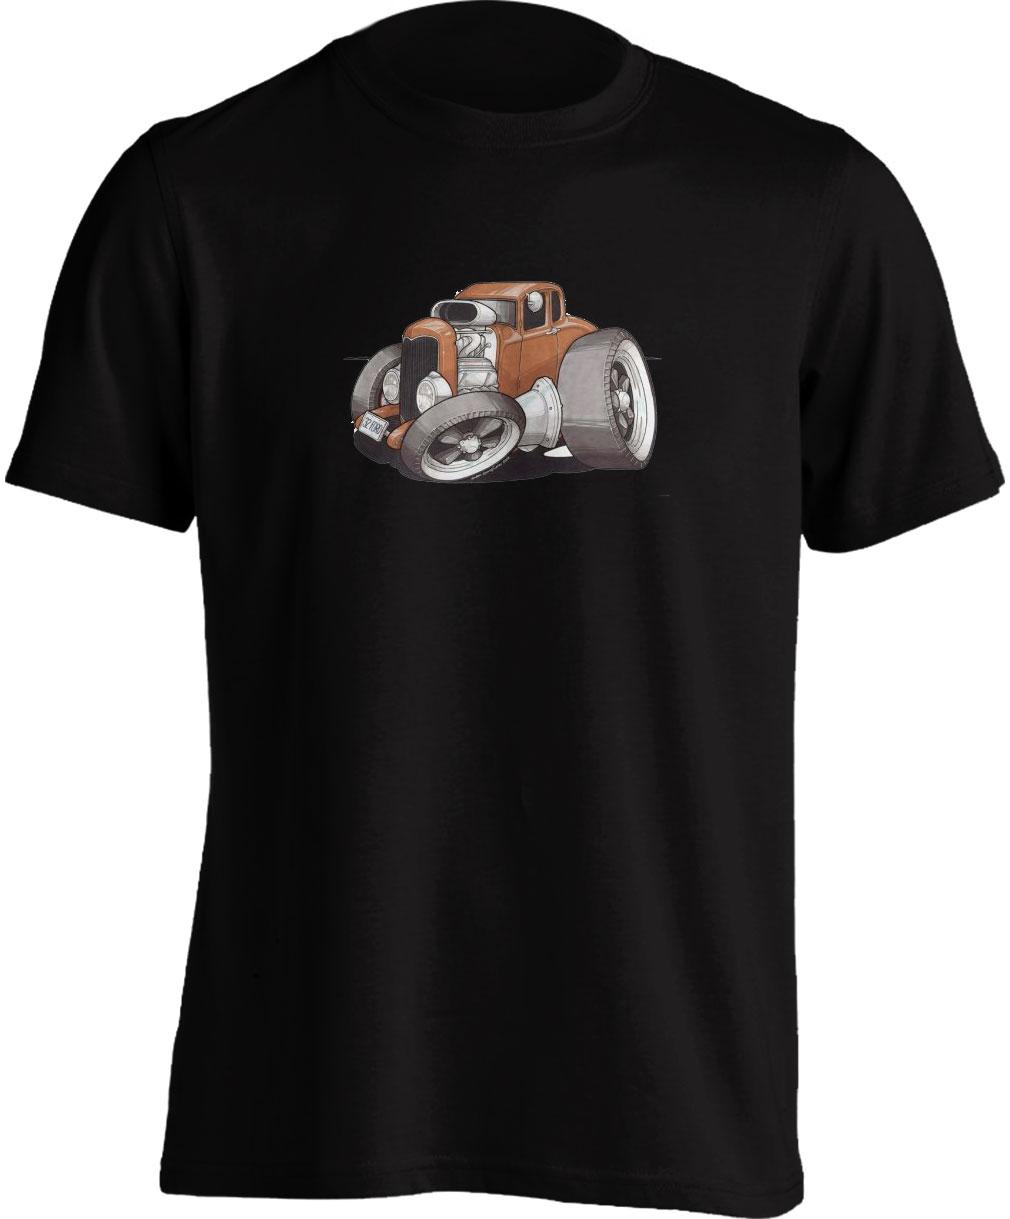 T Shirt Koolart 32 Brown/Orange 3231